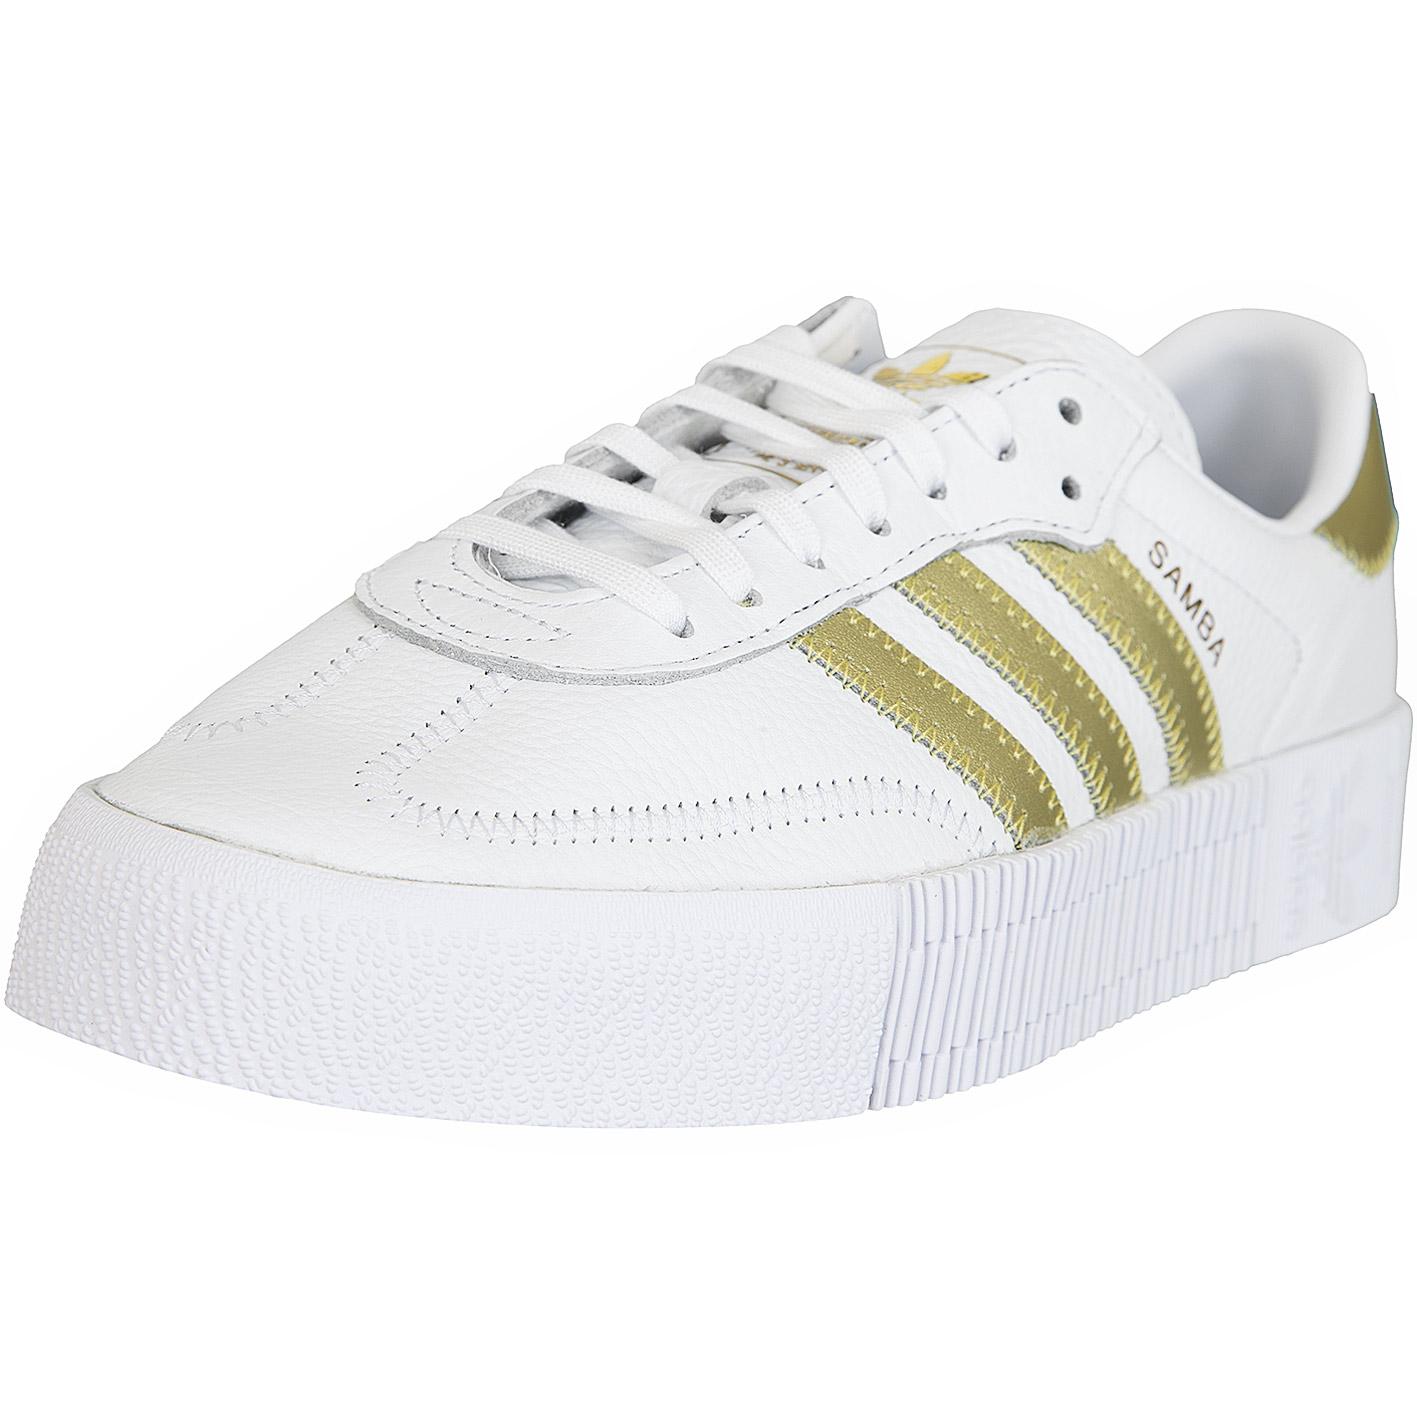 sneaker adidas weiß damen